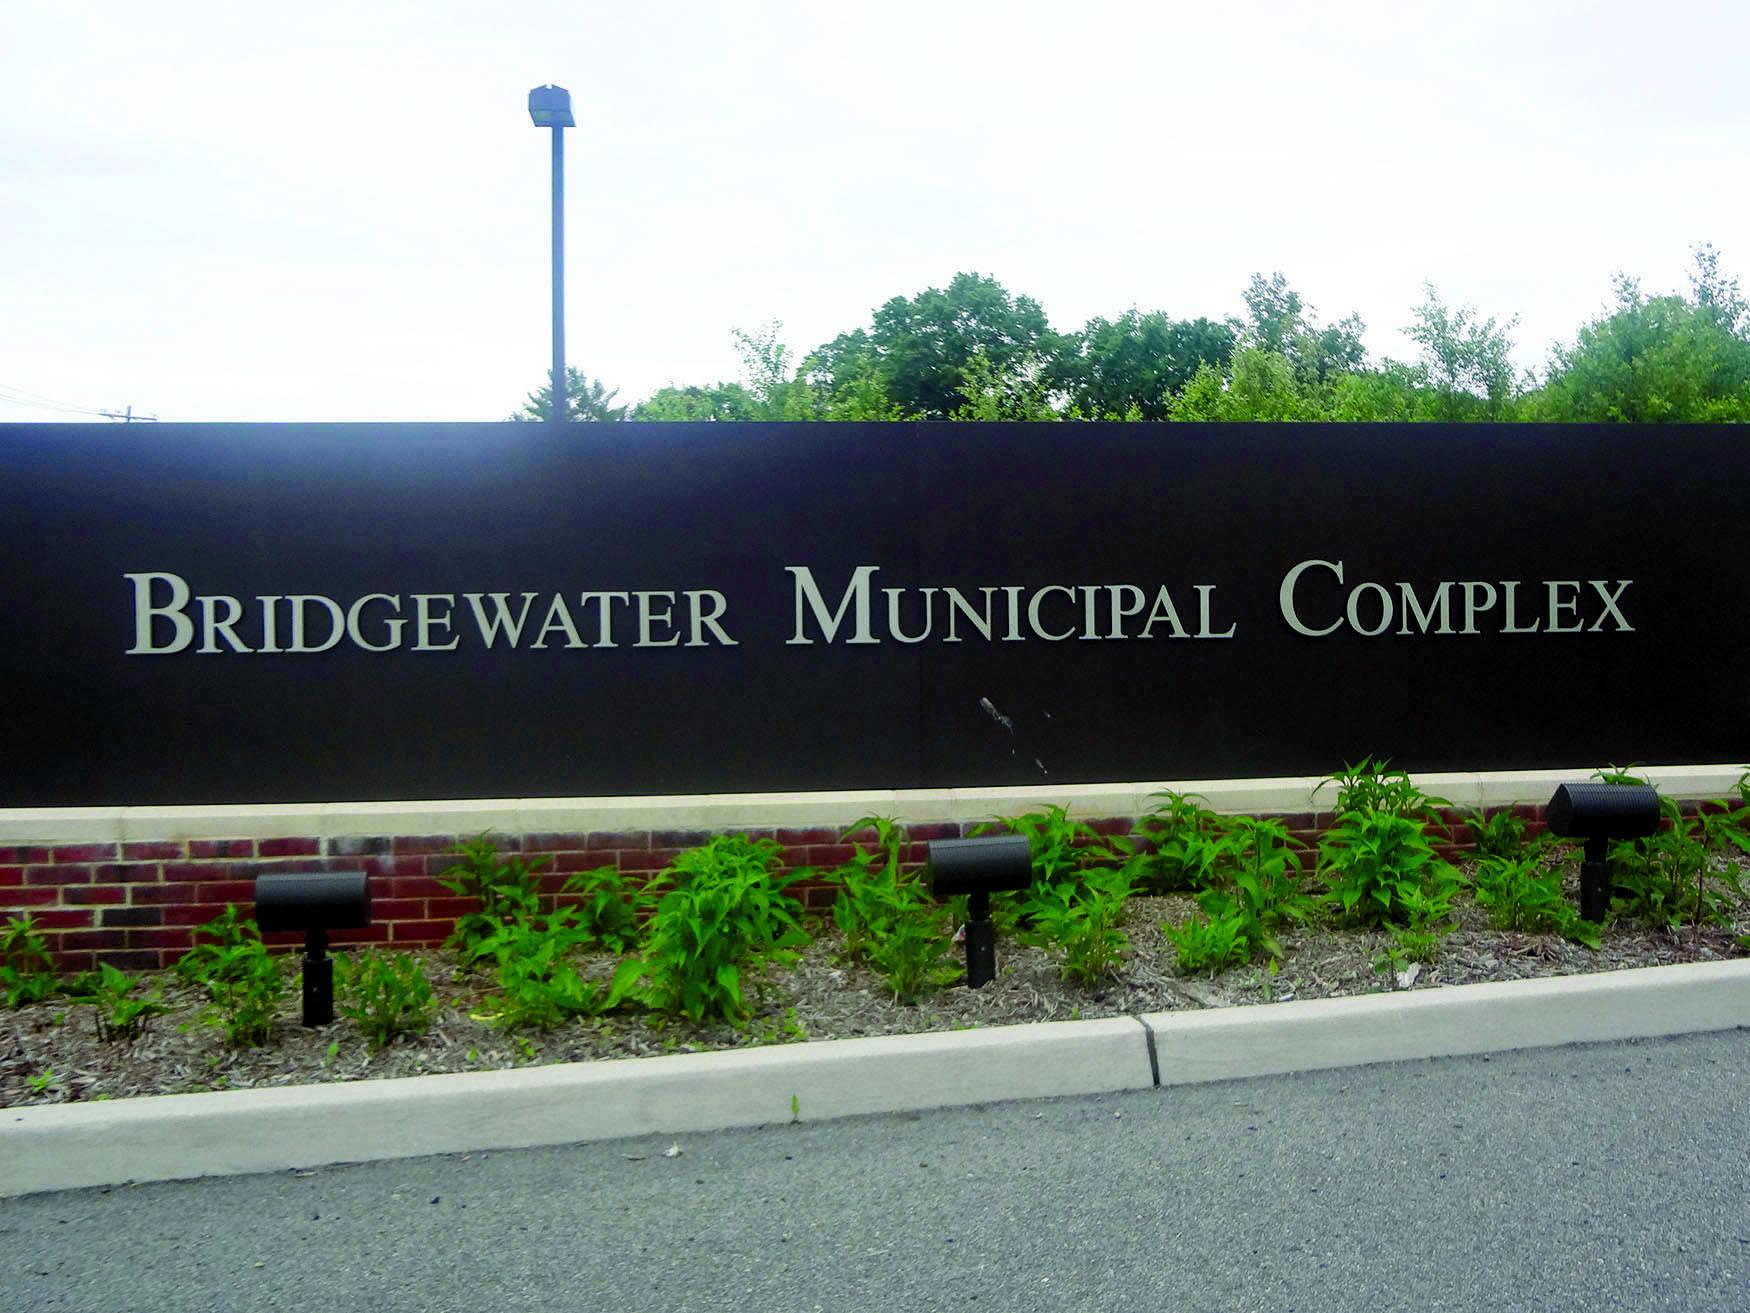 8932a6b026053ed32375_Bridgewater_municipal.jpg